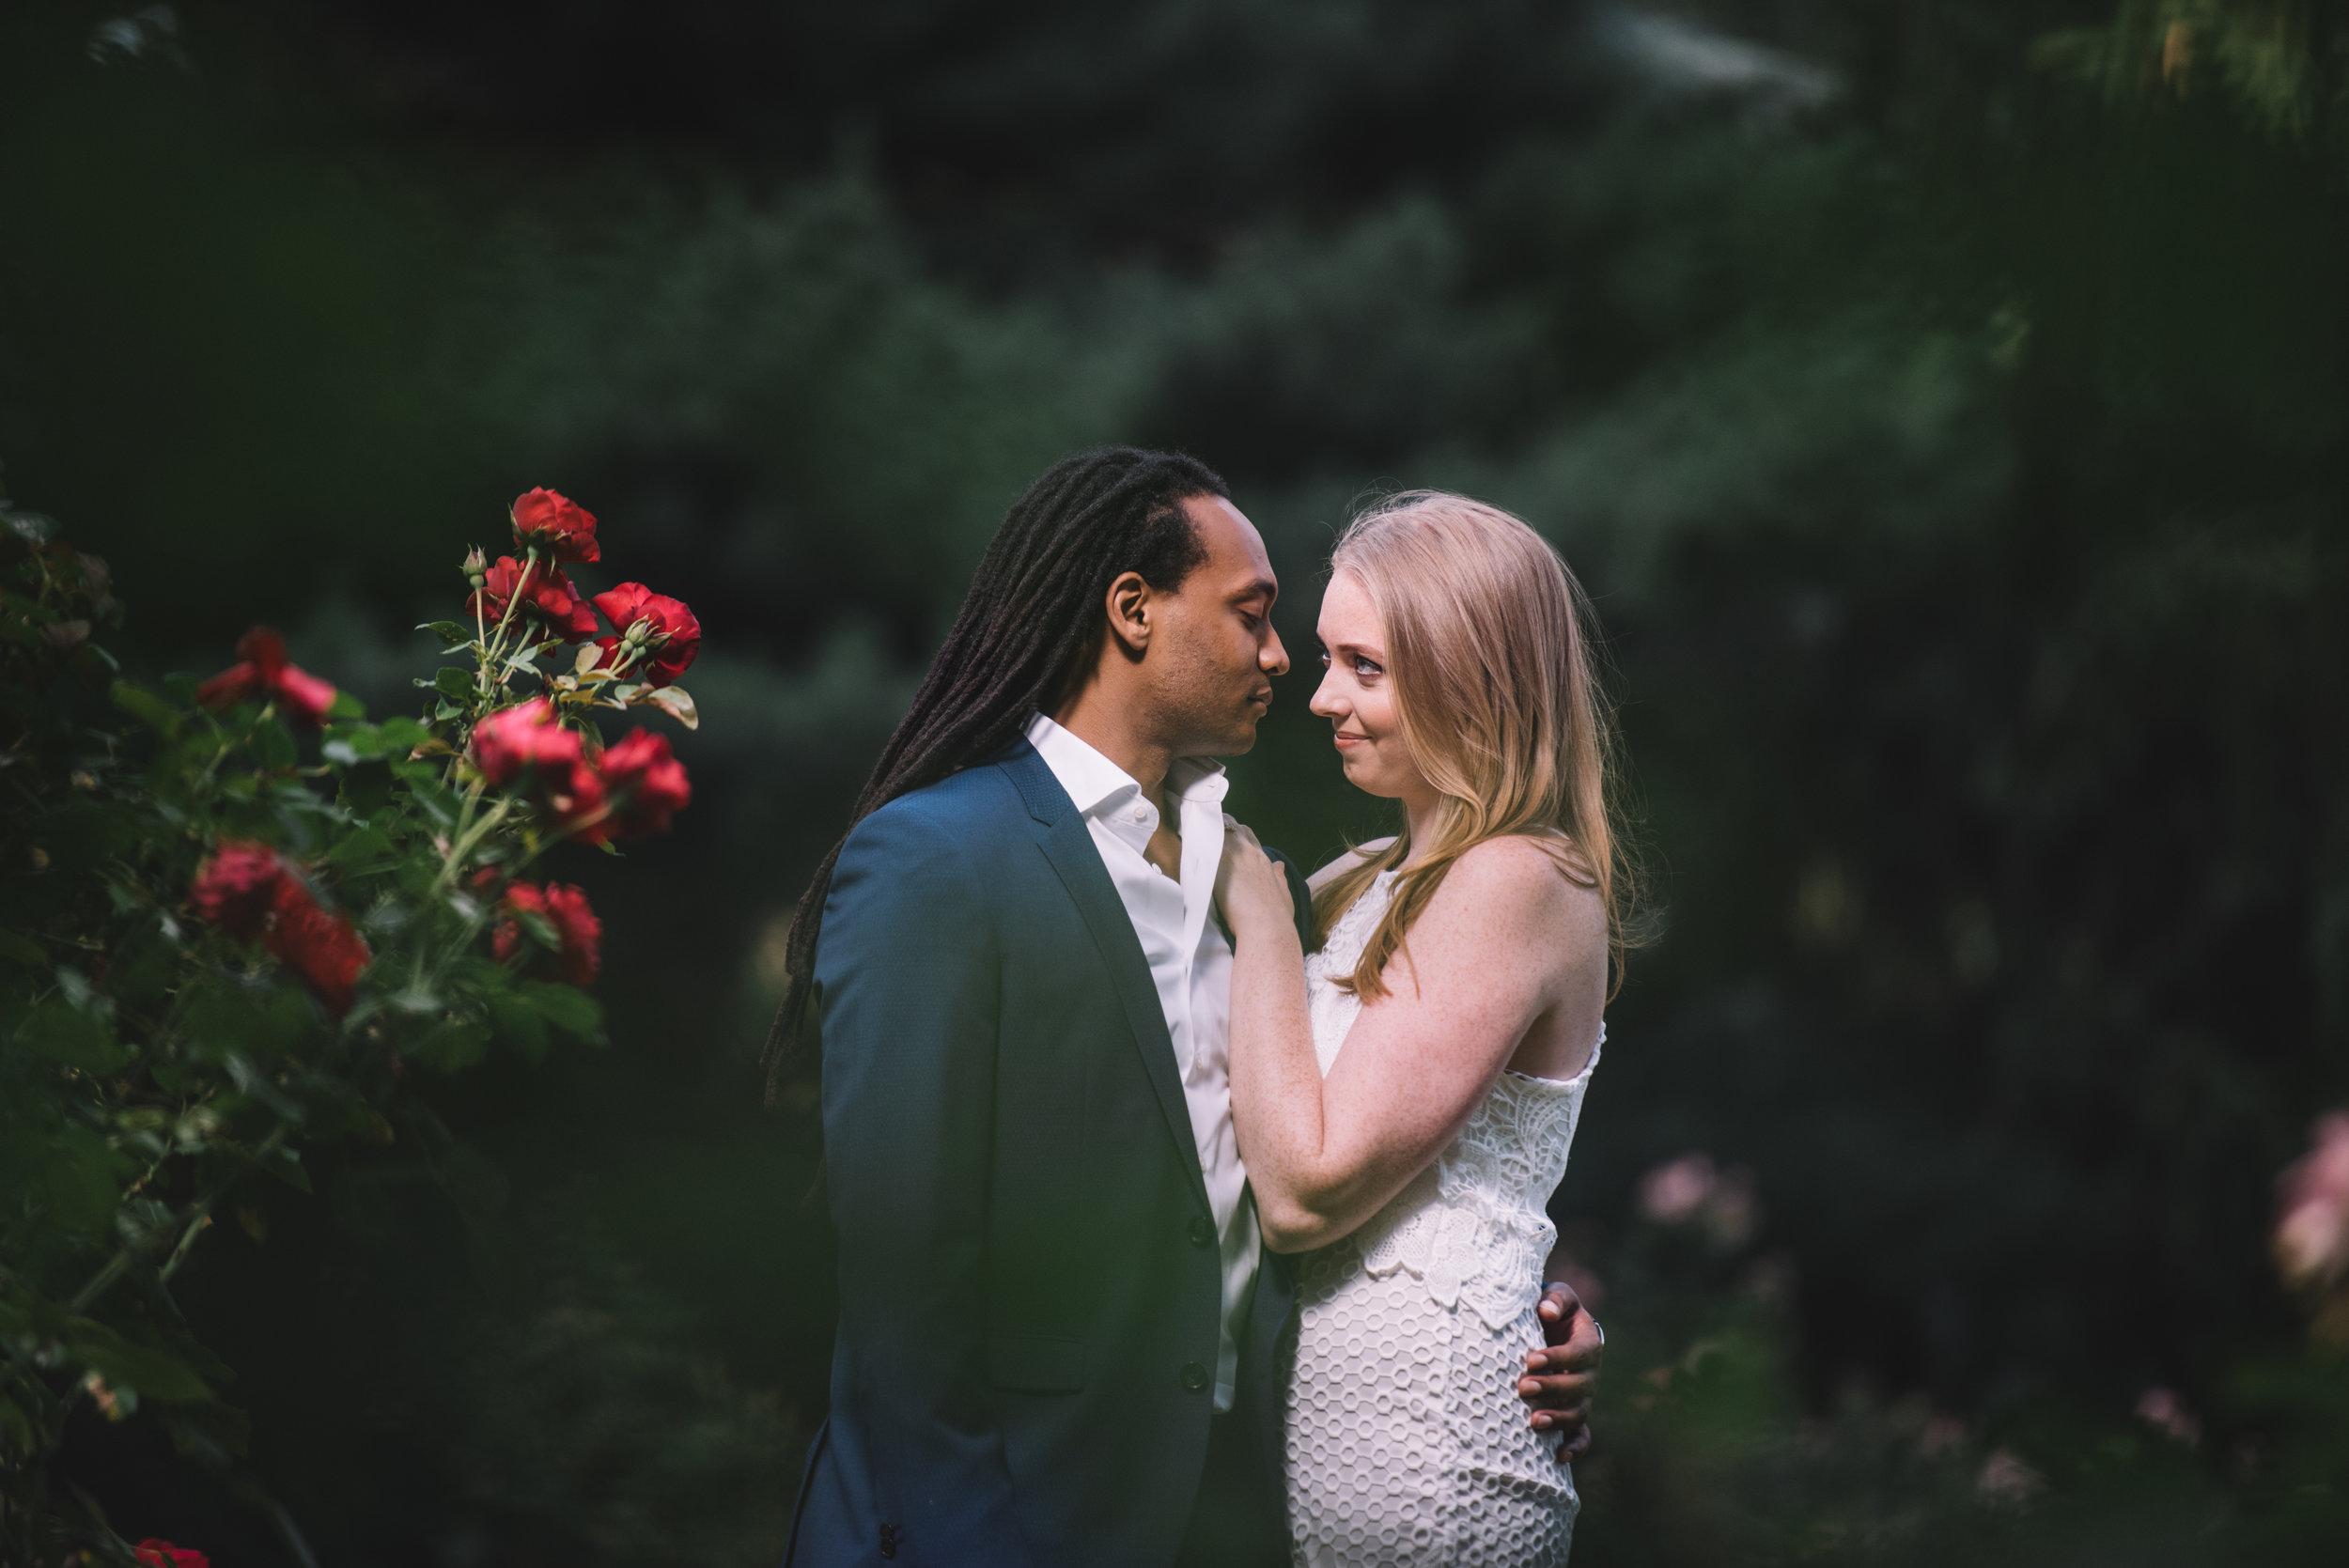 WeddingPhotos | NJPhotographer | Highlights-3-12.jpg